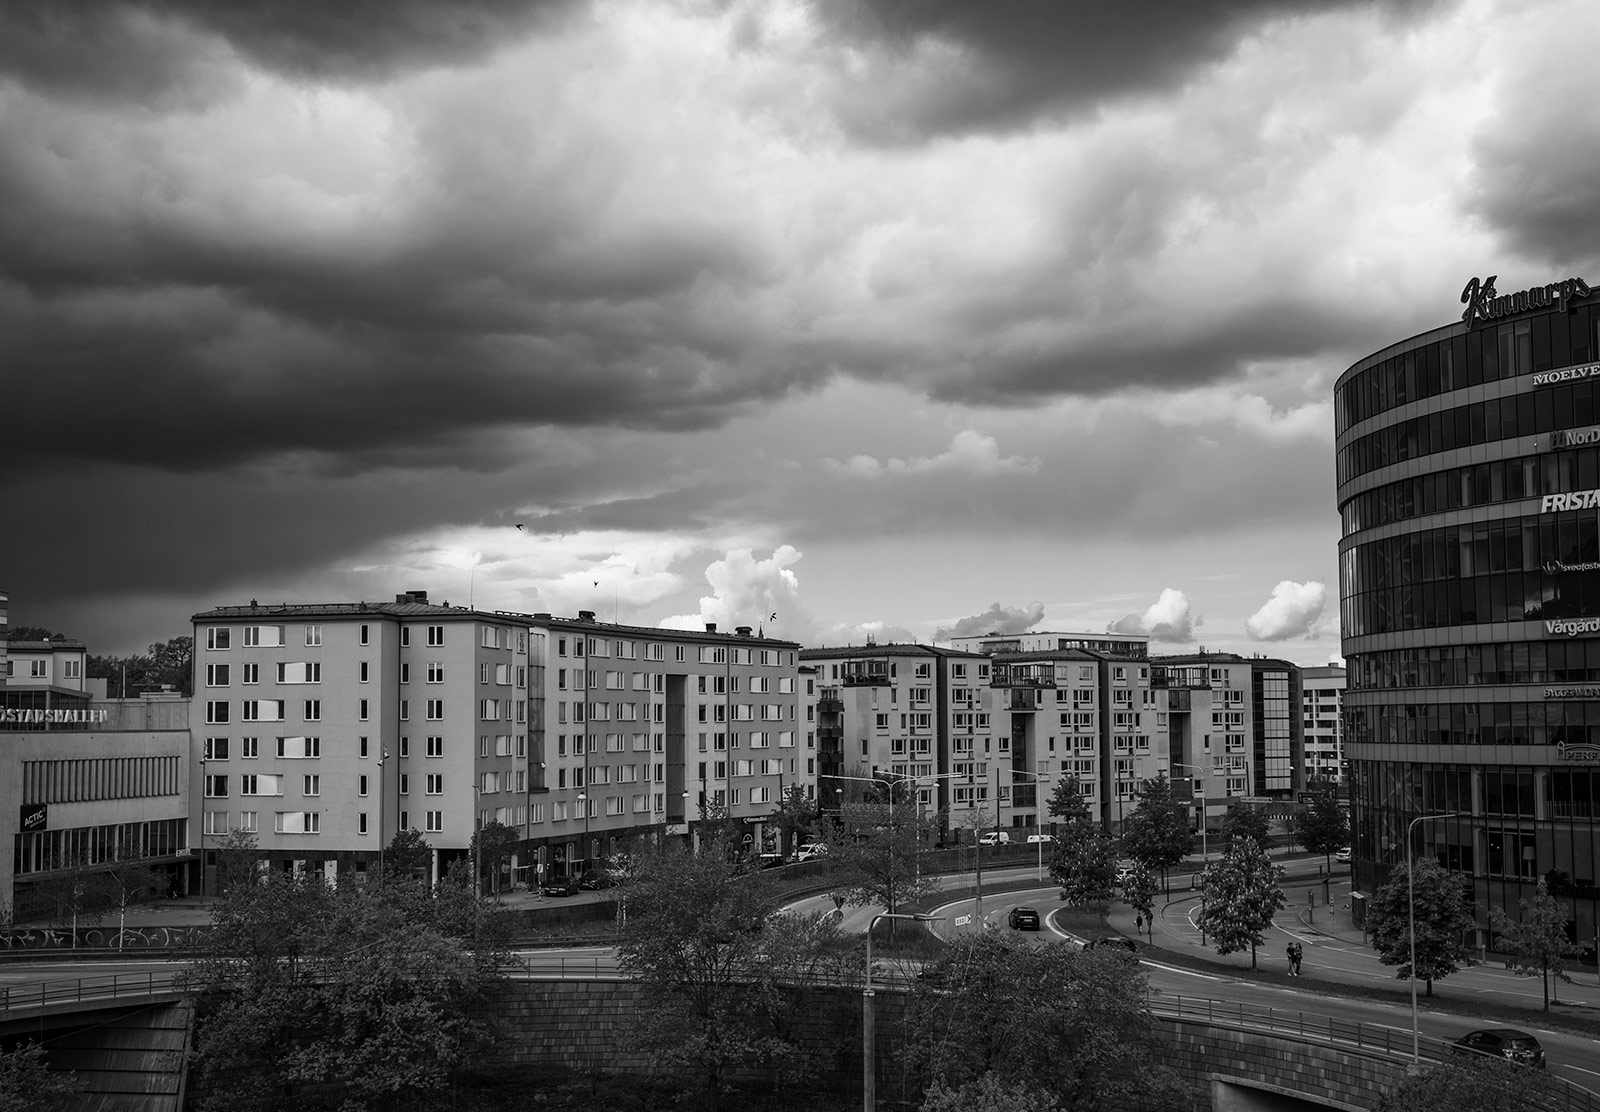 Dark cloud over buildings